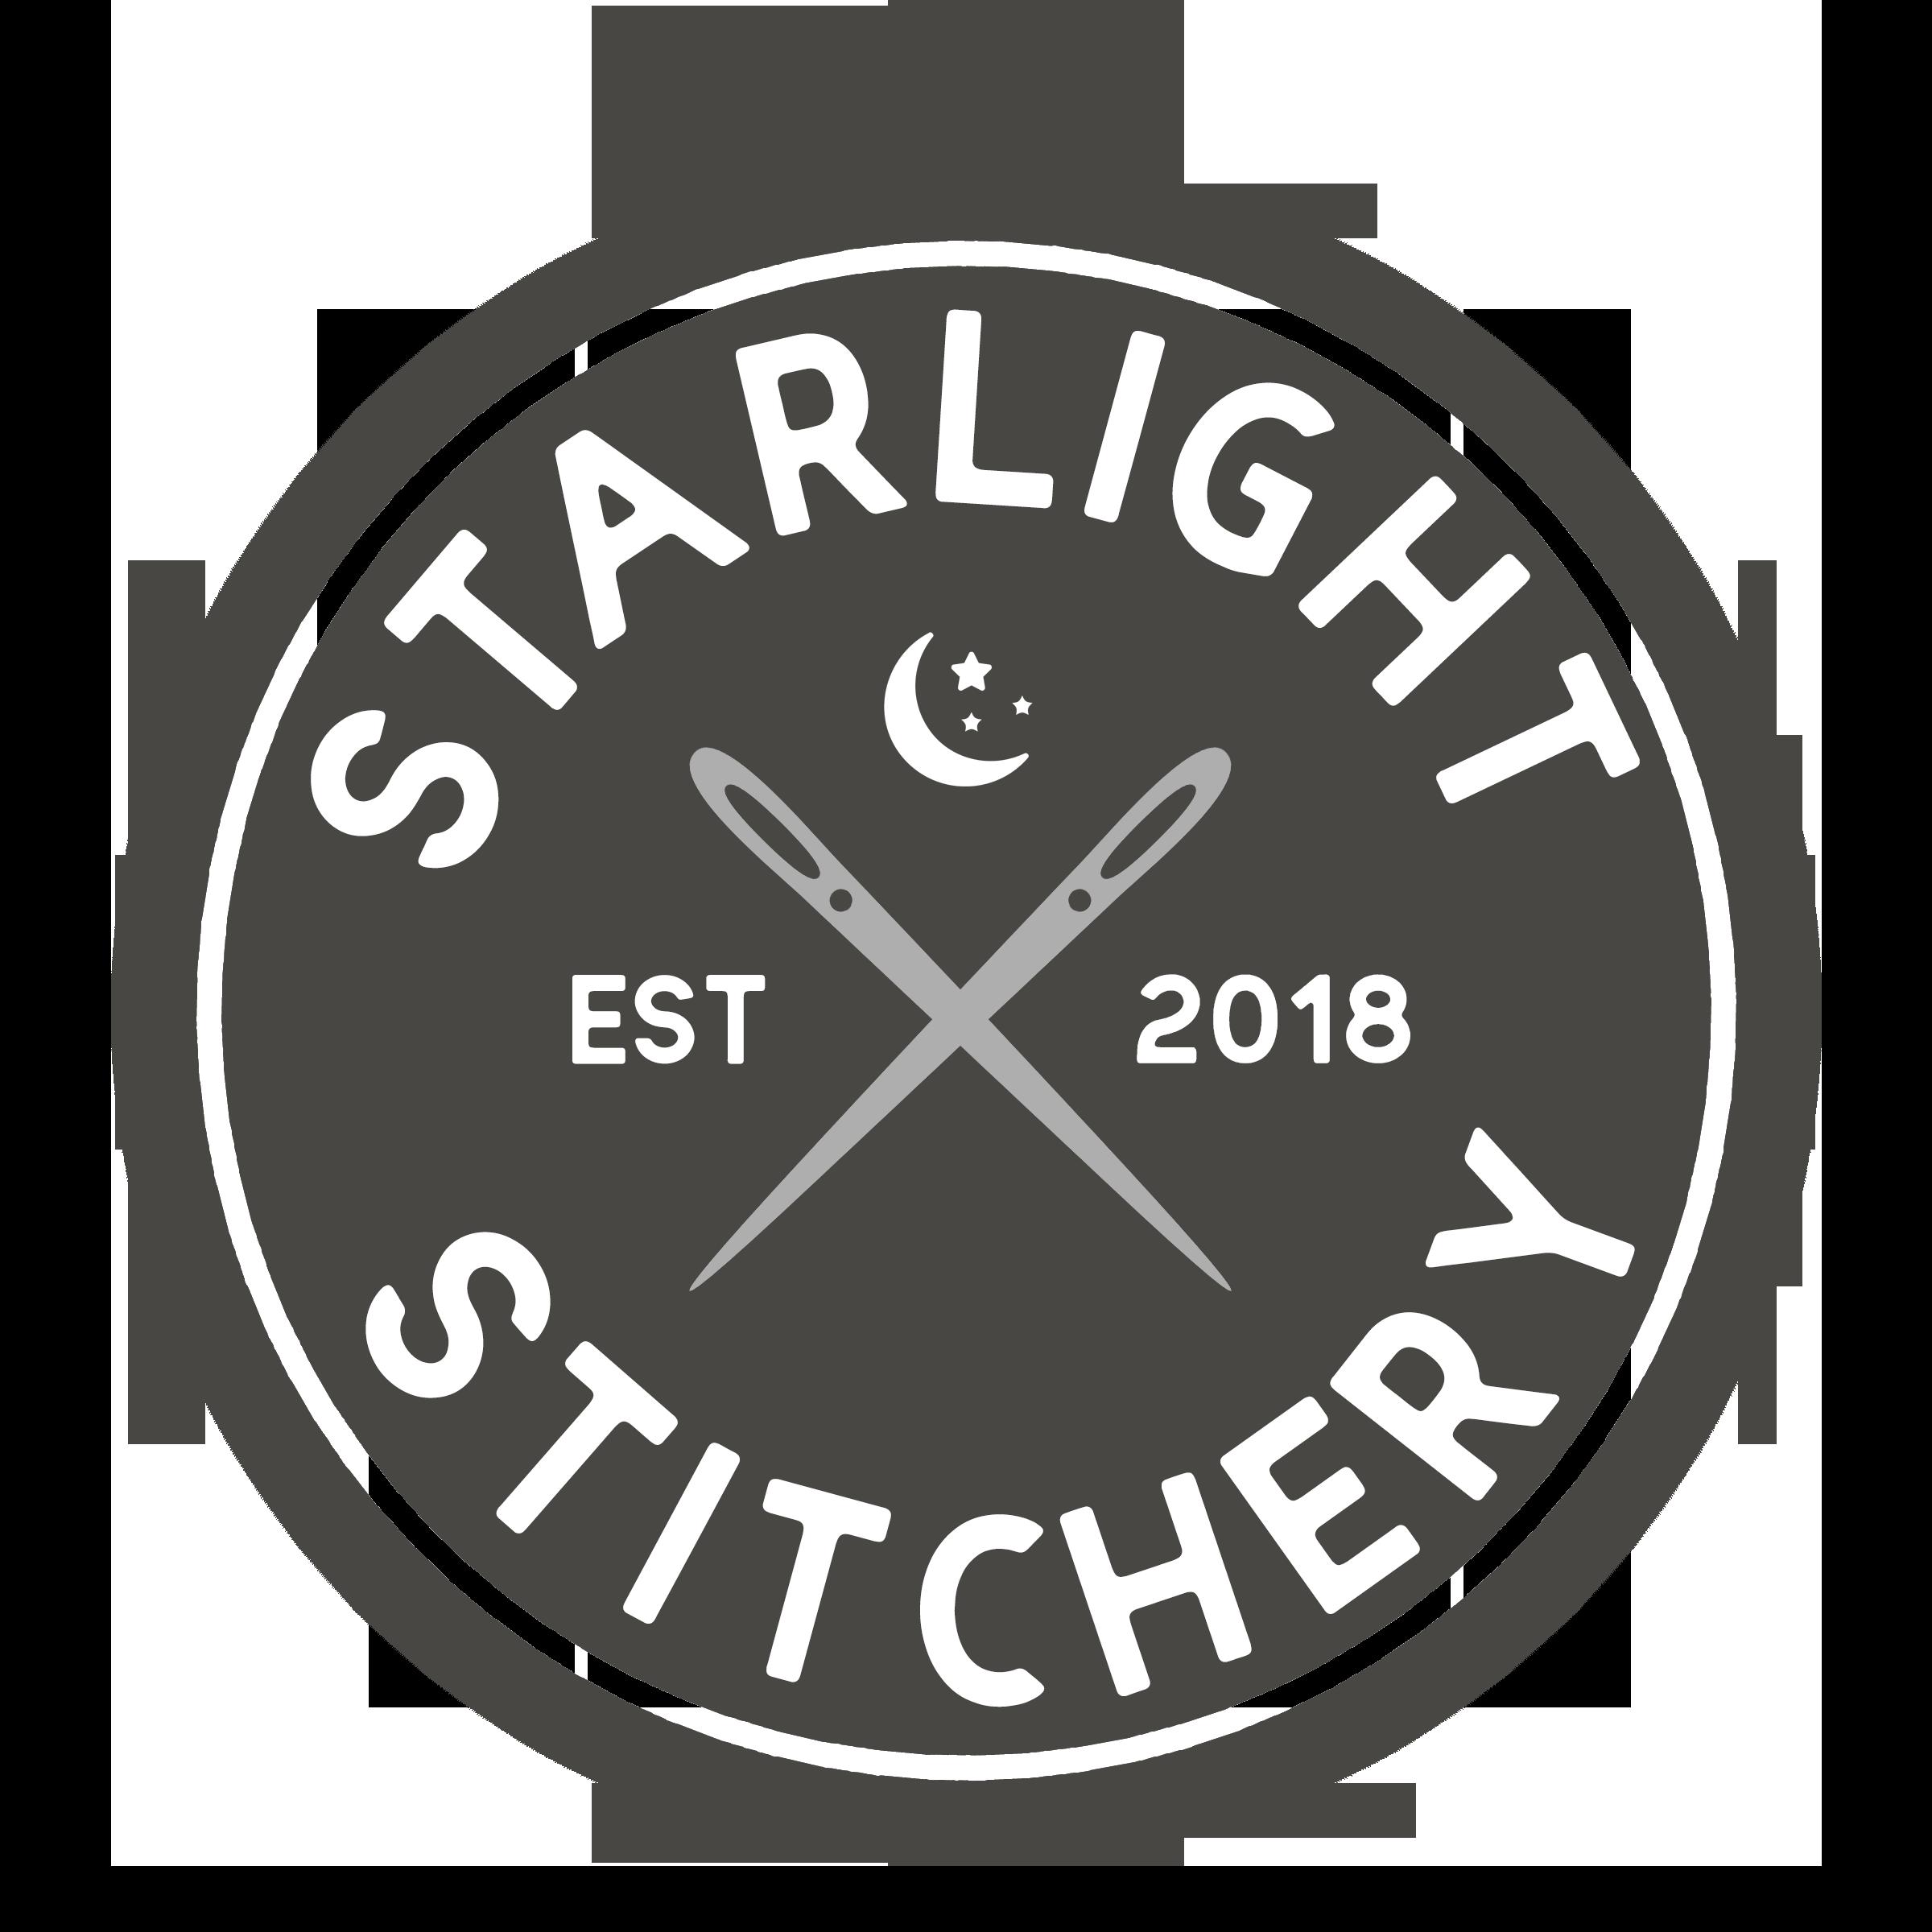 Starlight Stichery logo